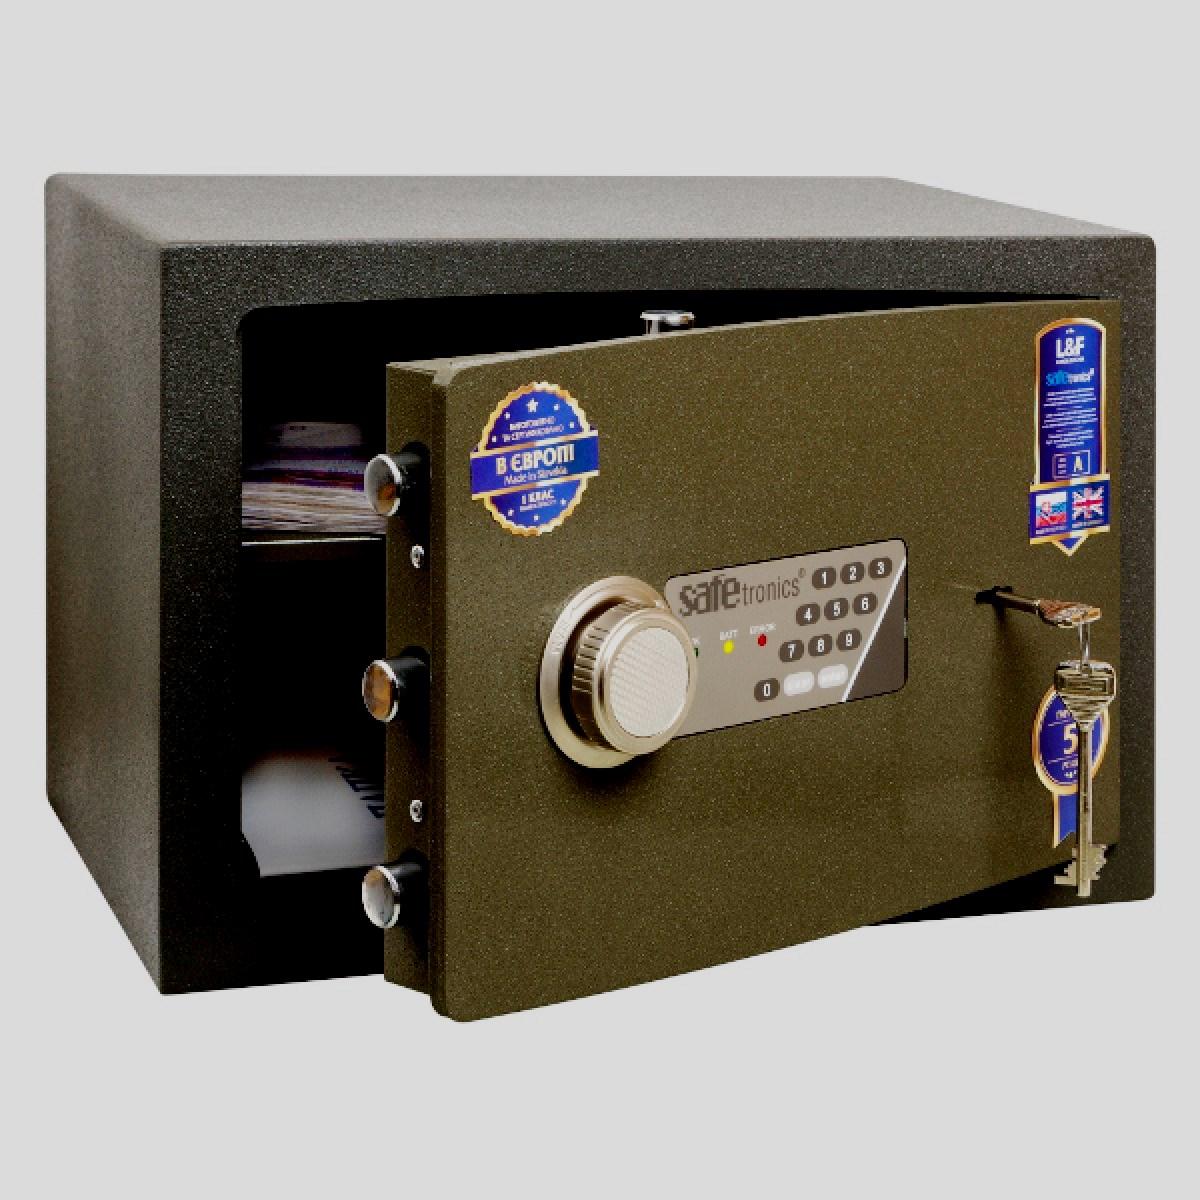 Safetronics NTR 24 Mes